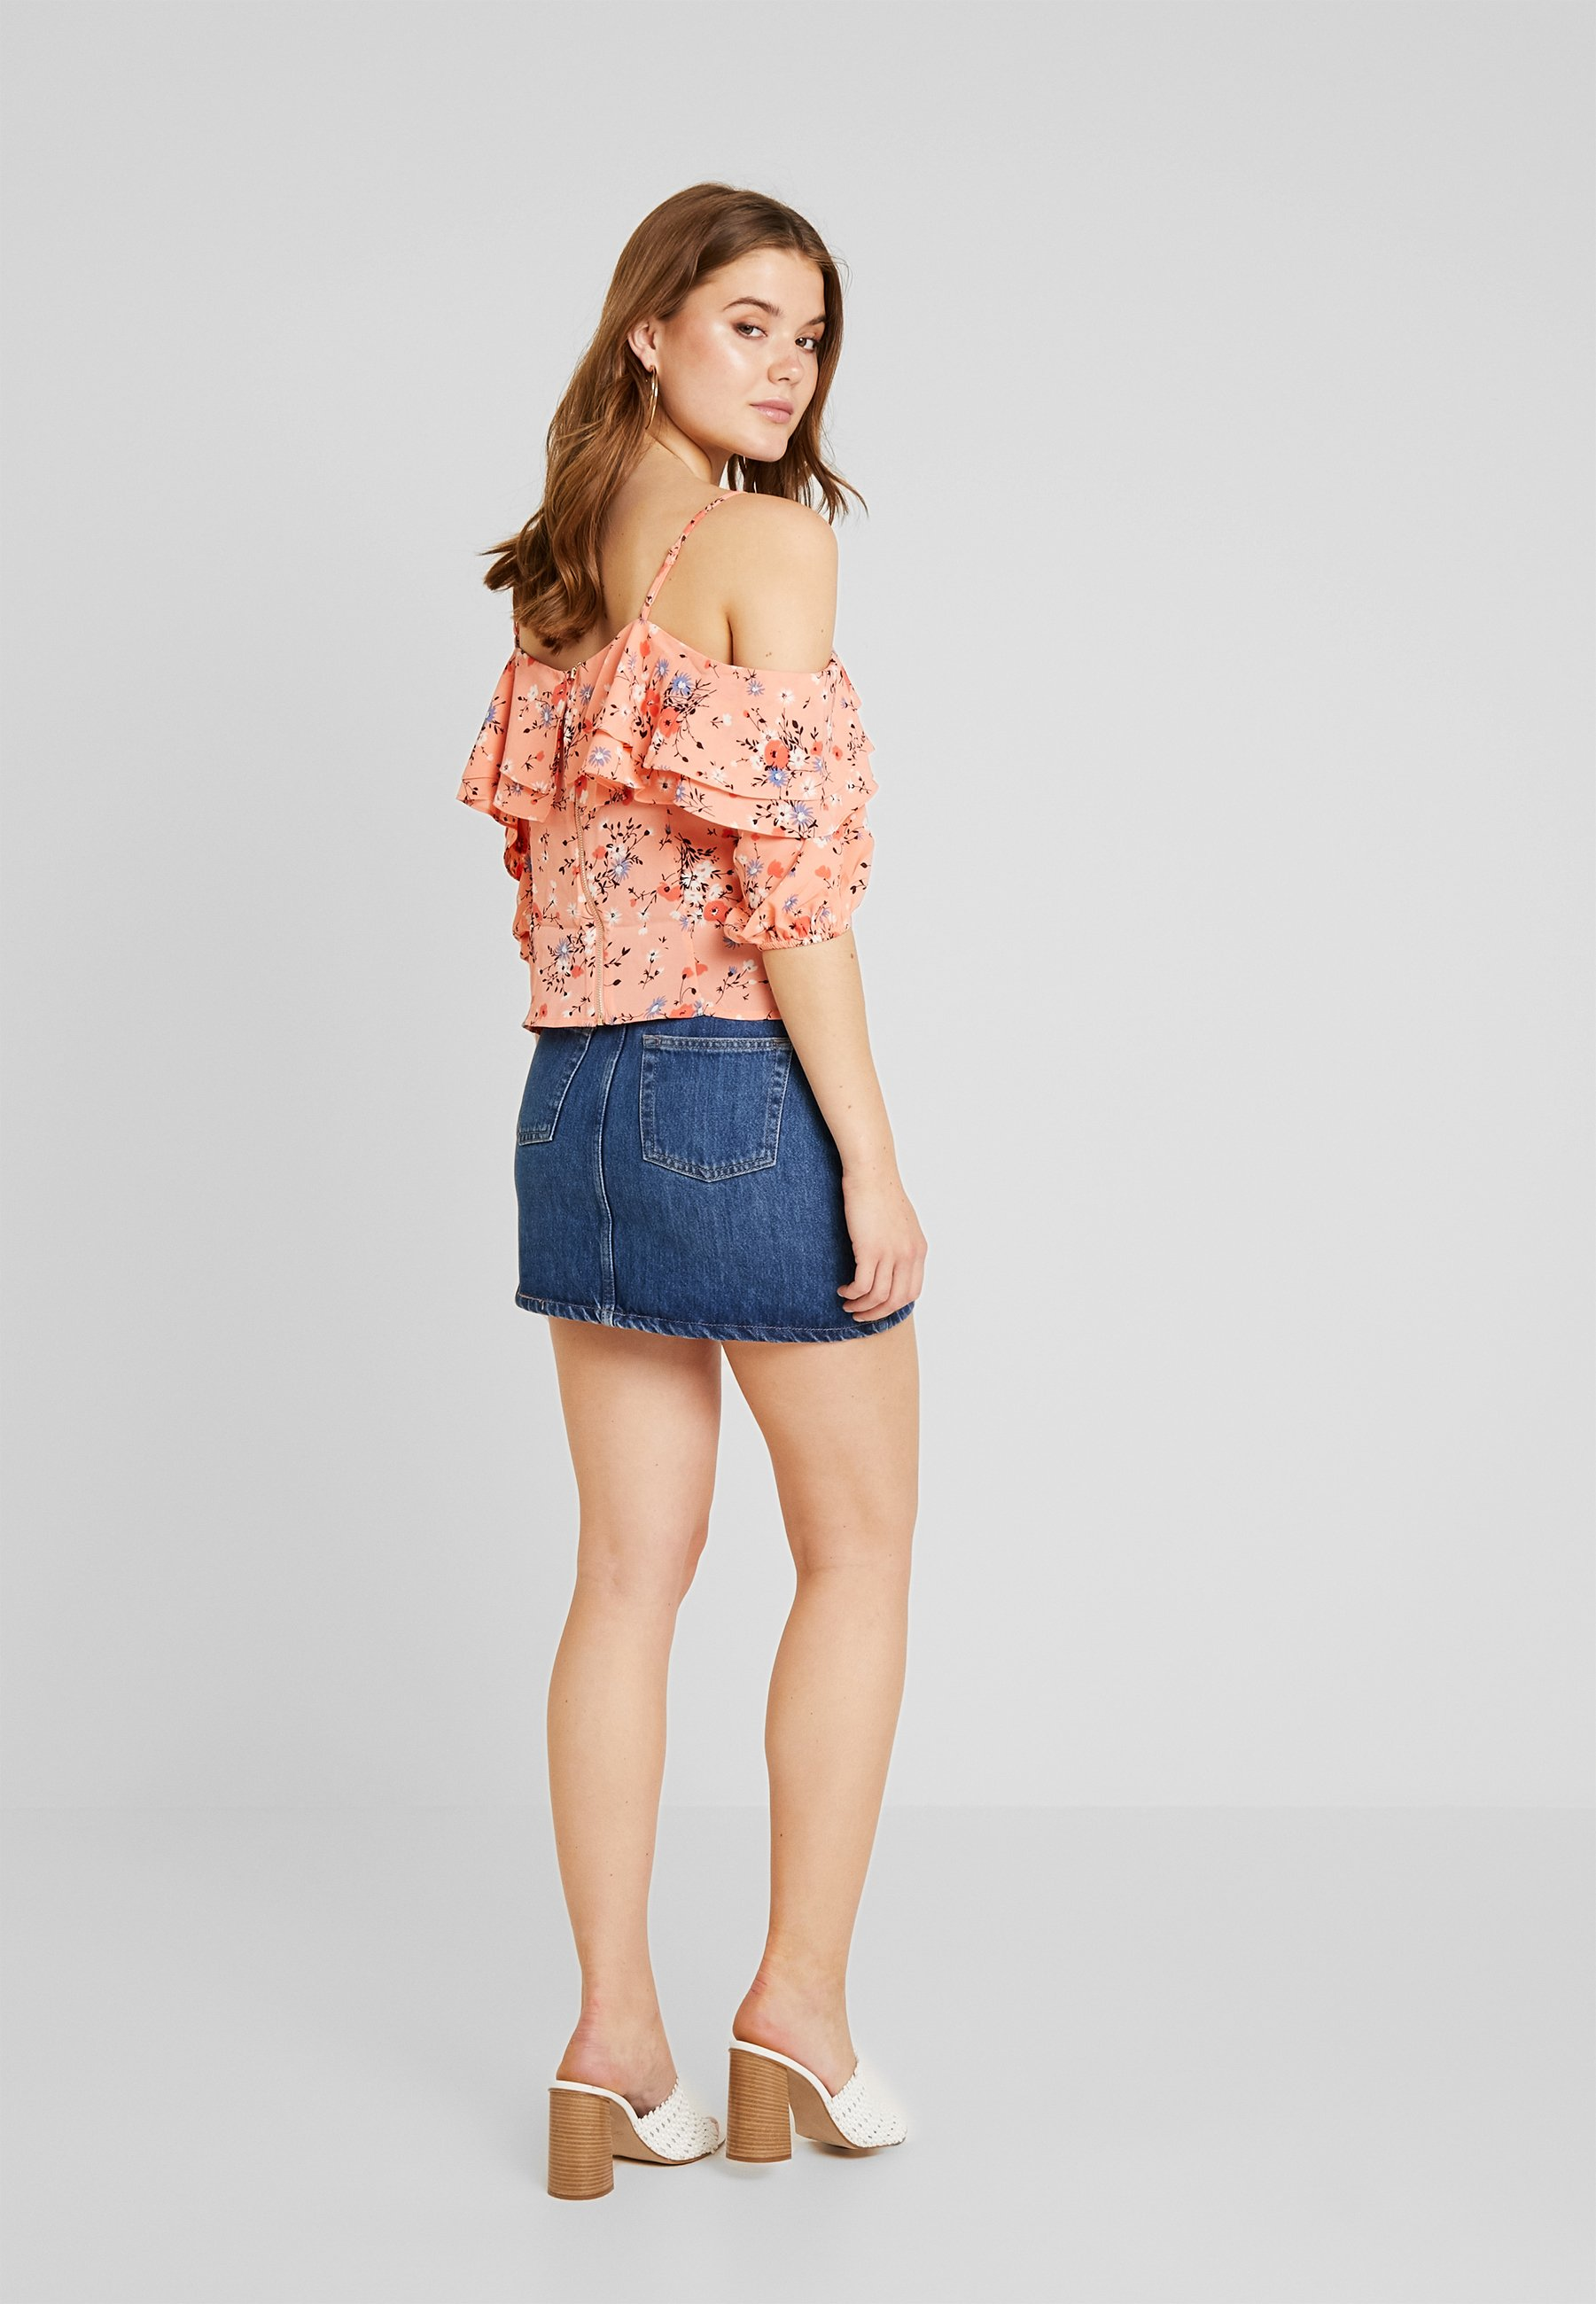 BardotBlouse Oasis Orange Fifi Floral Multi wOPXikuZT